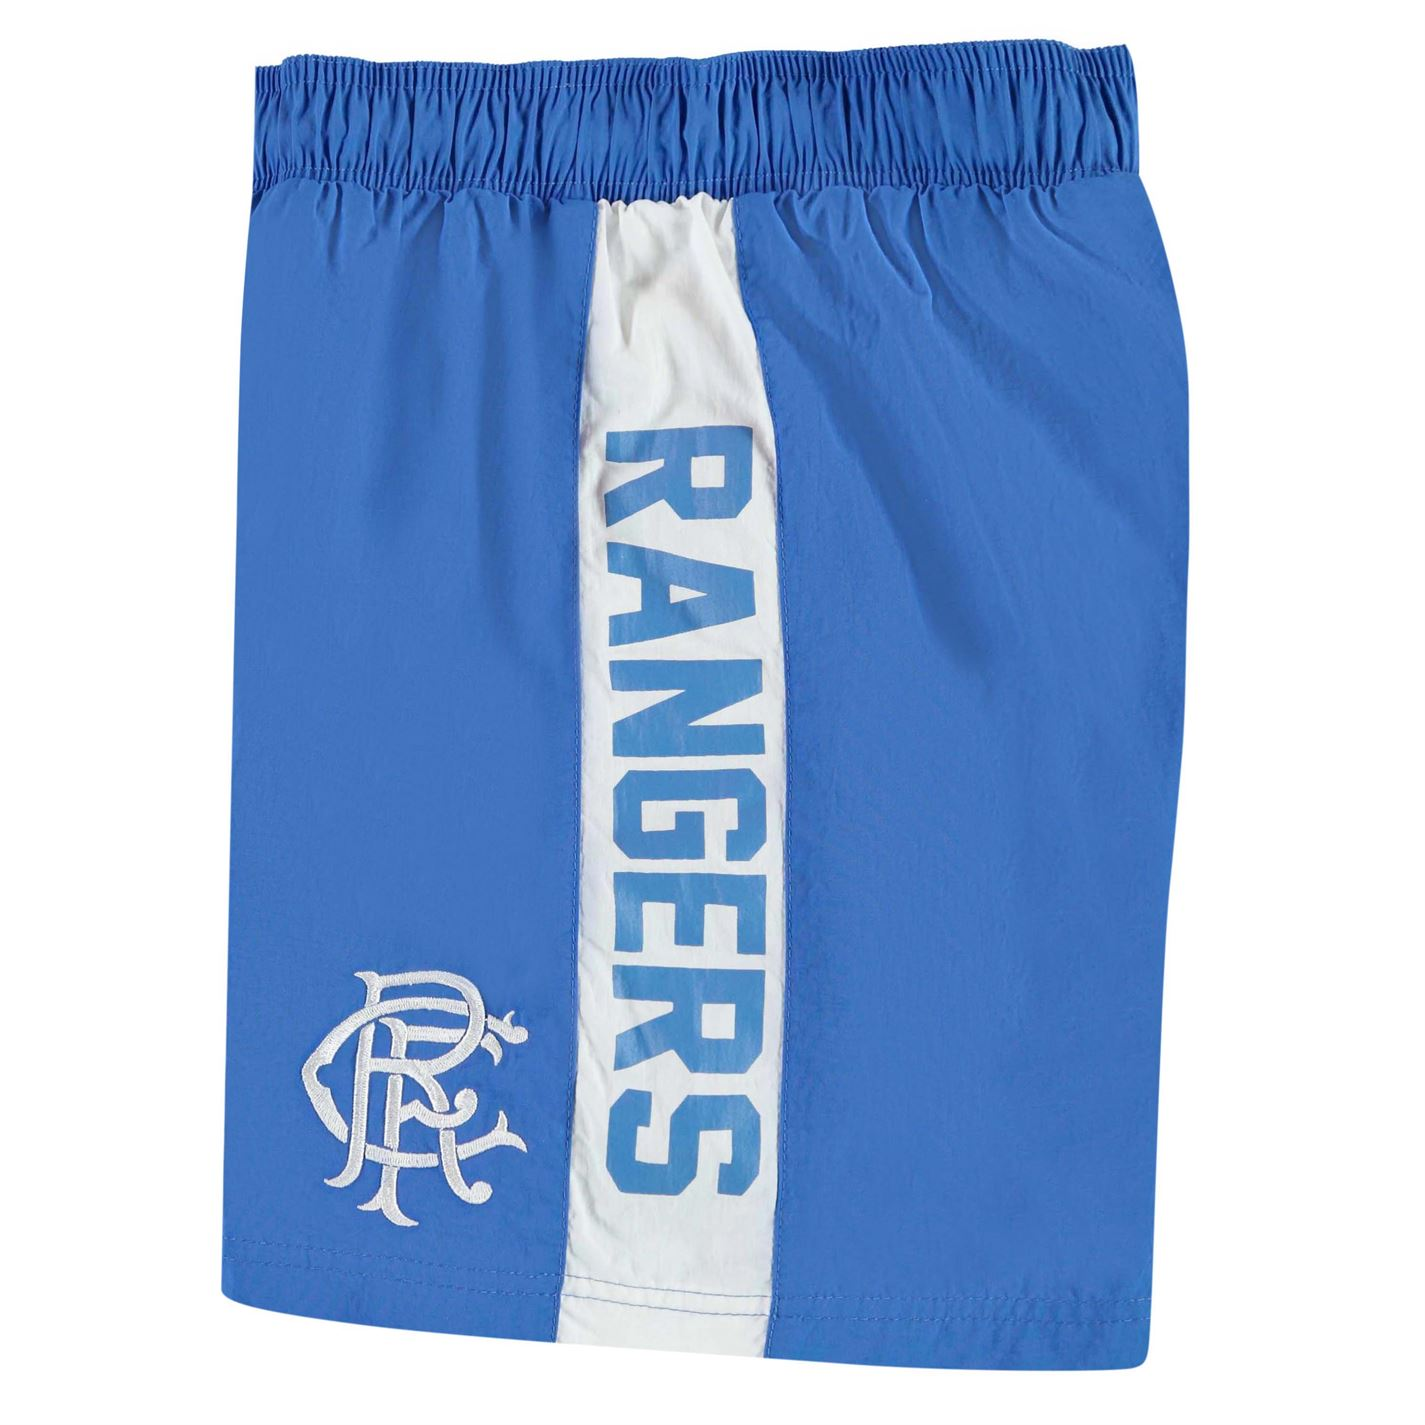 Team Kids Boys Newcastle United Swim Shorts Junior Pants Trousers